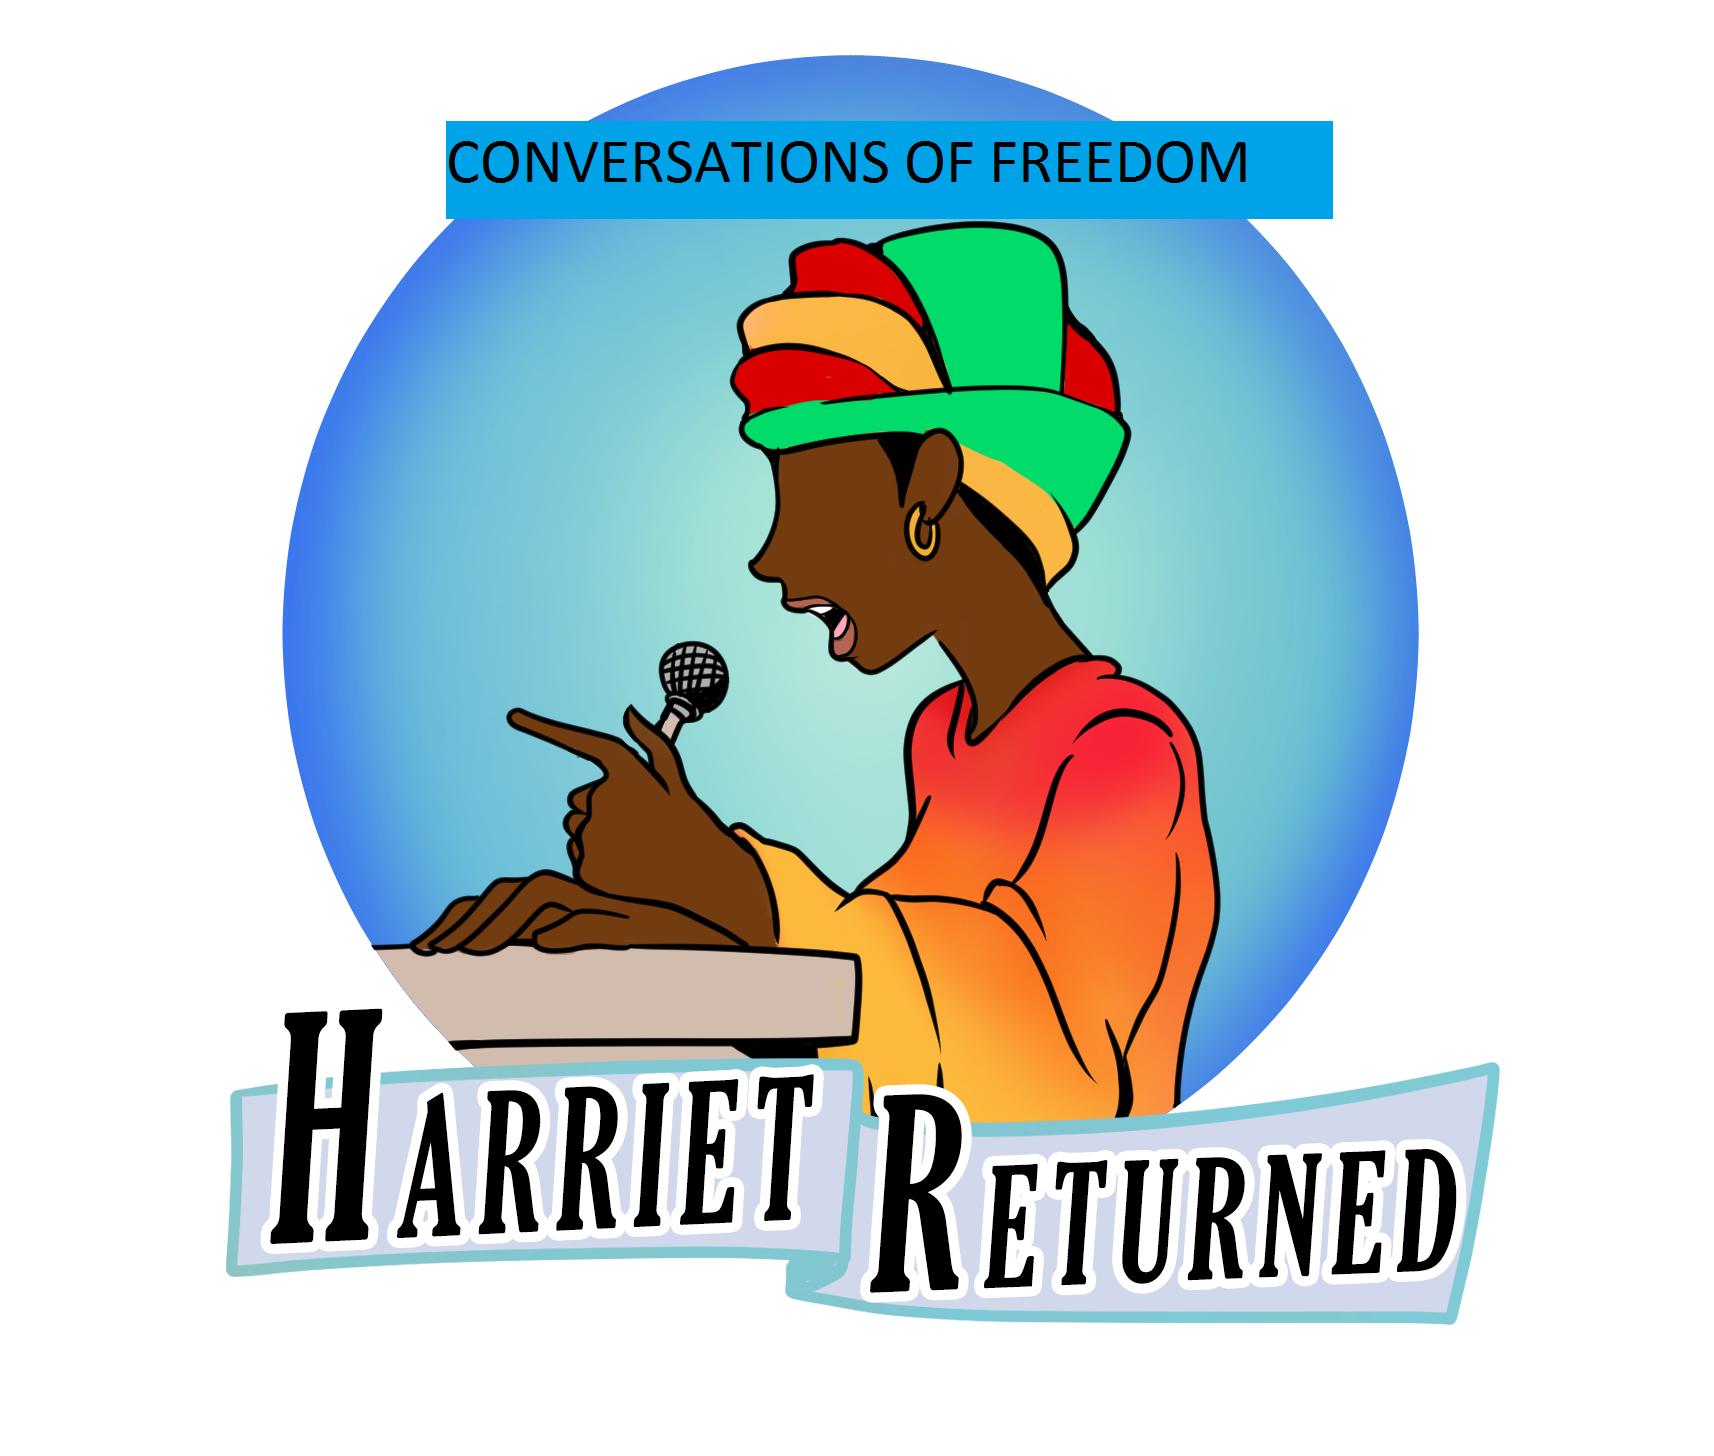 Conversations of Freedom